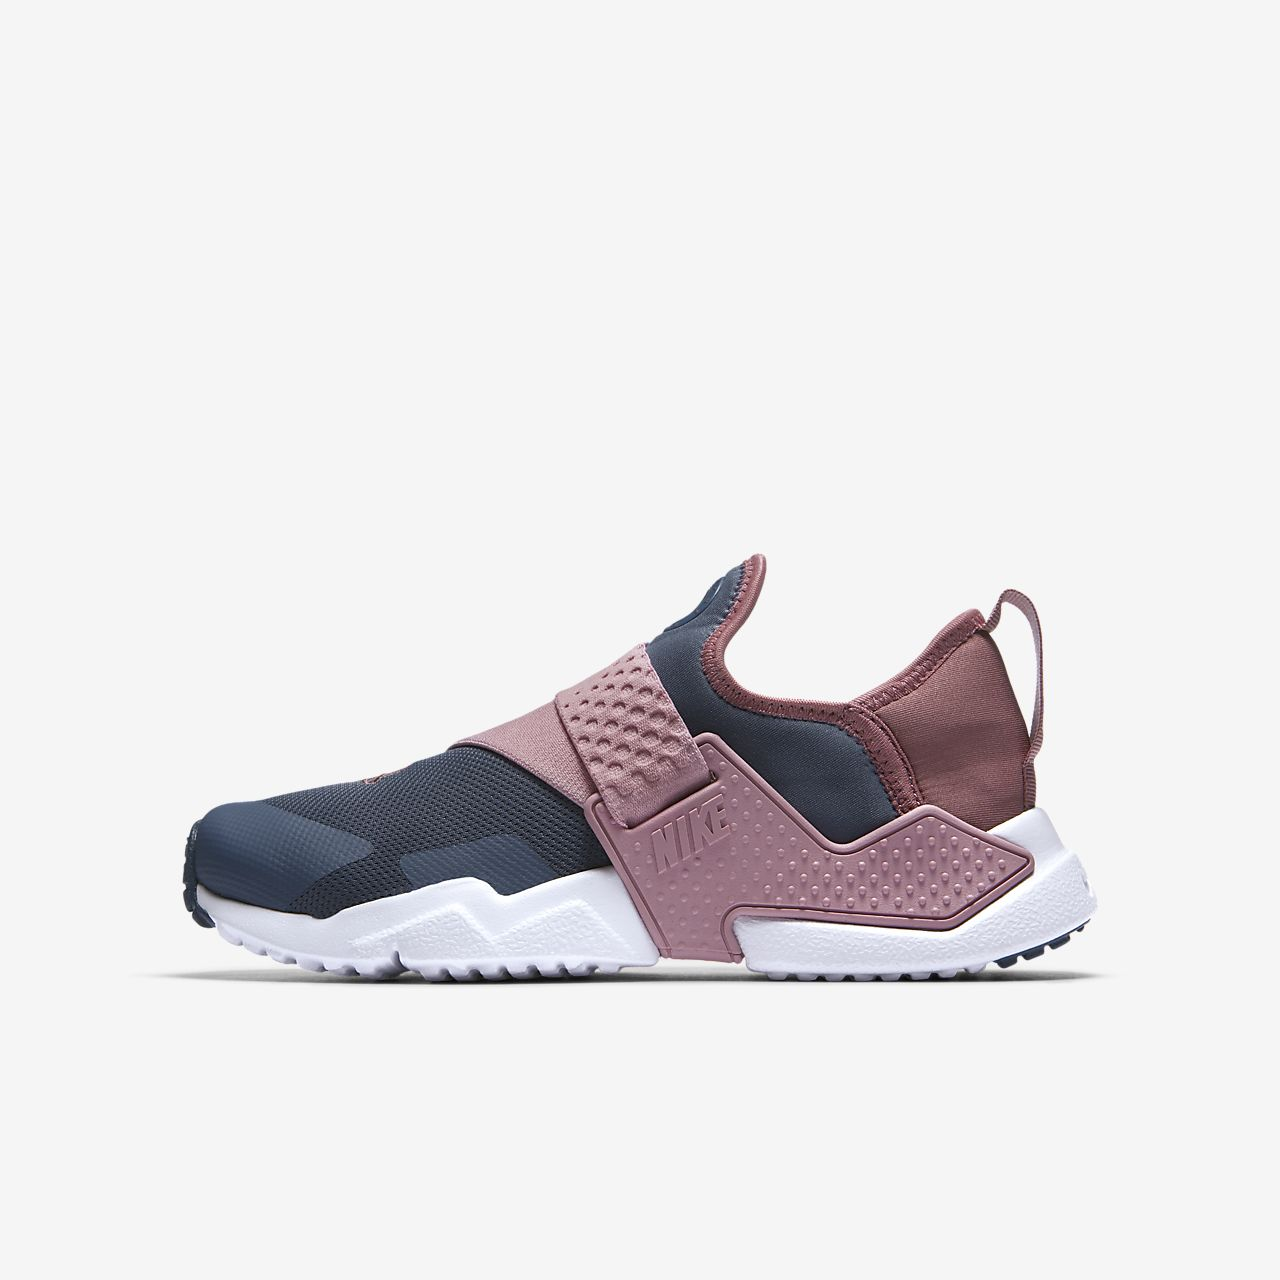 Nike Huarache Extreme